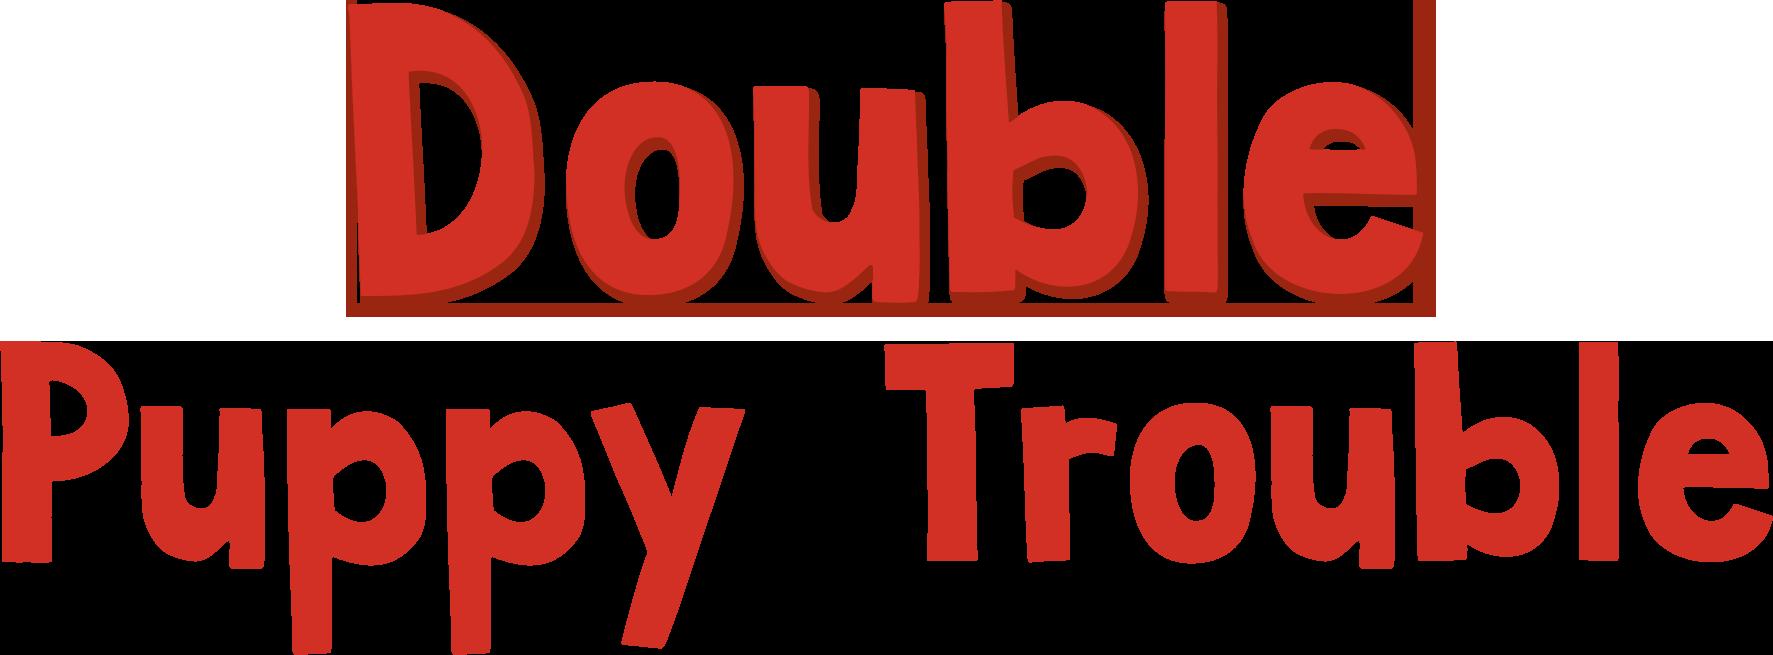 Double Puppy Trouble by Danica McKellar